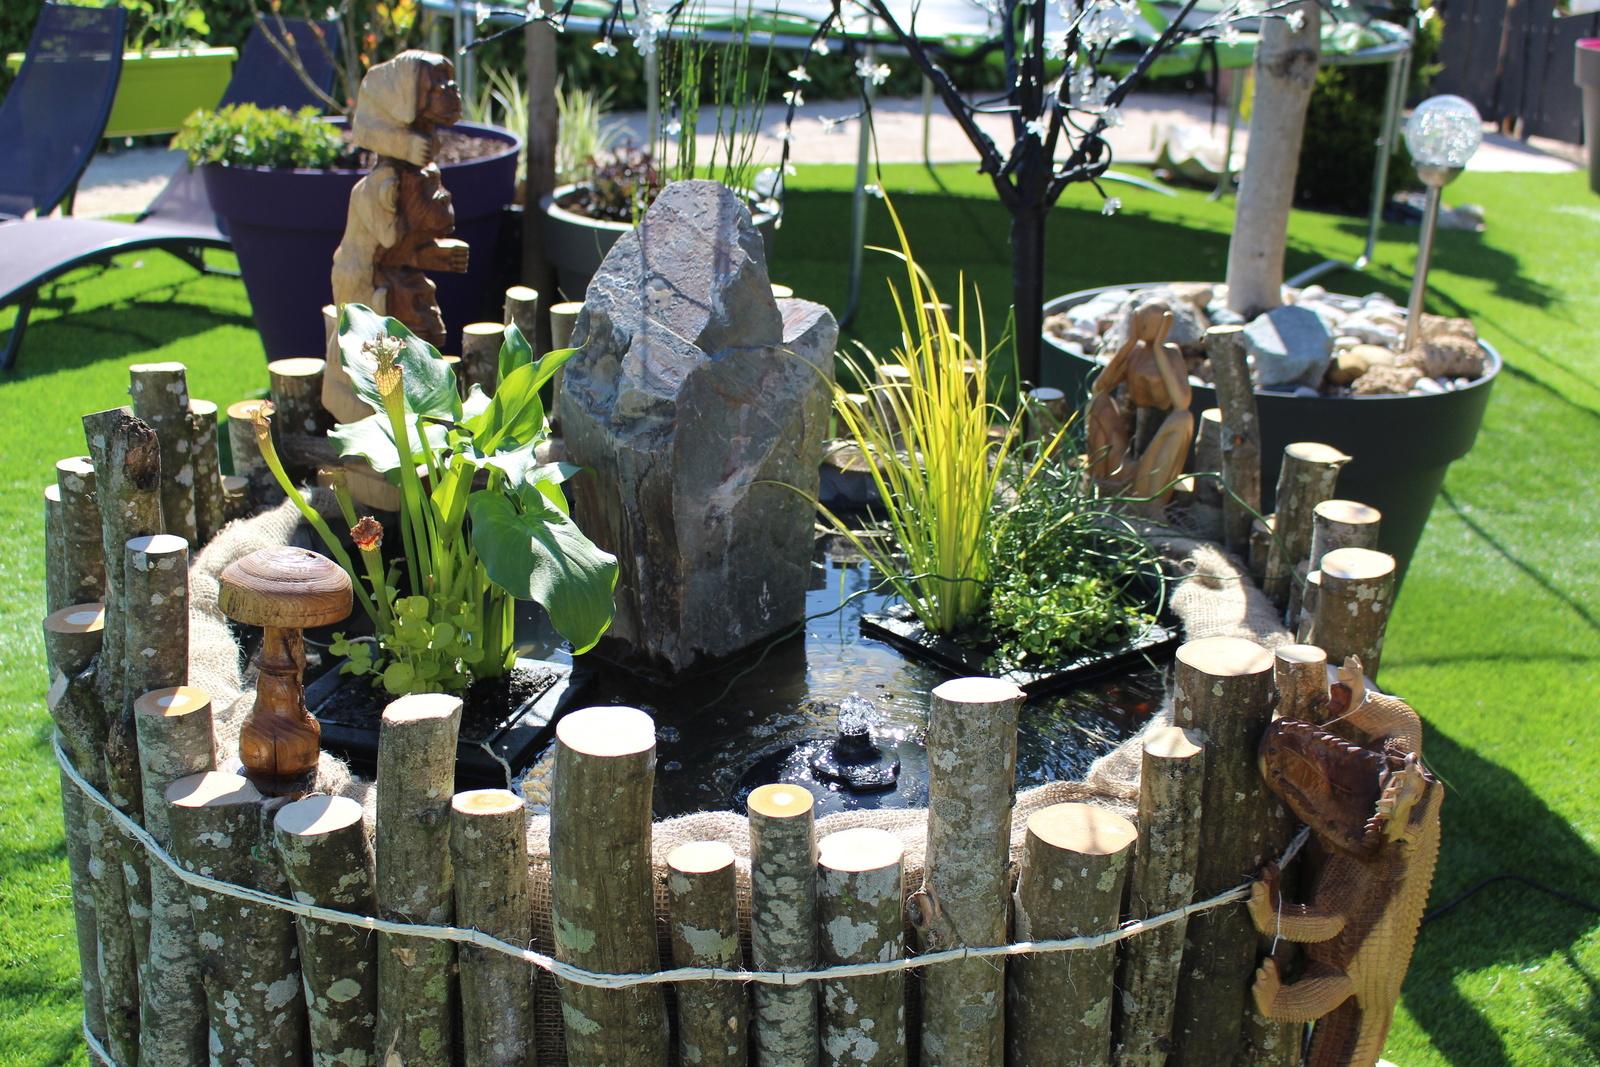 Petit Bassin Pour Petit Jardin - Du Jardin A La Terrasse serapportantà Bassin Pour Petit Jardin